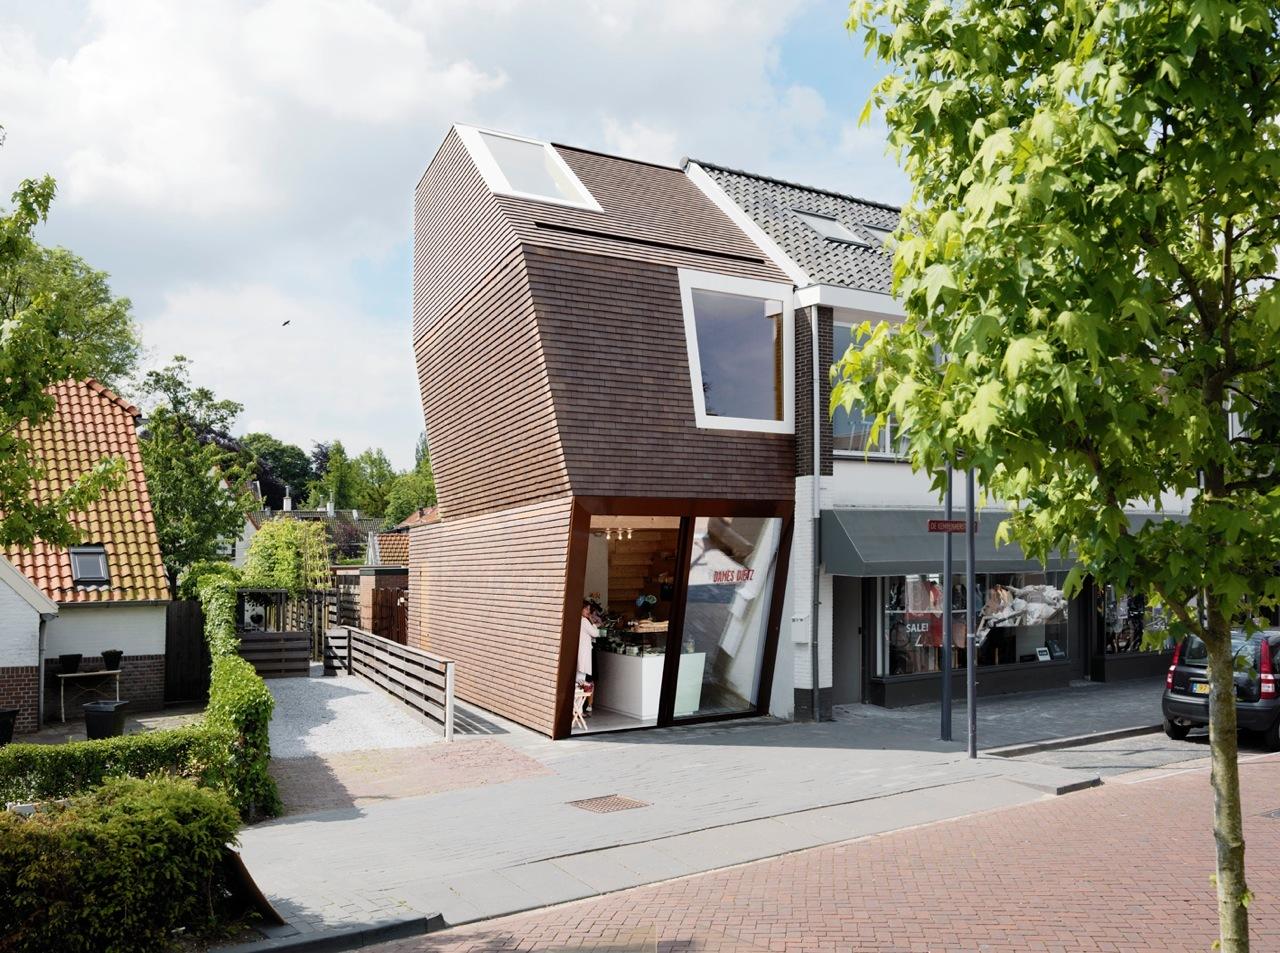 Novo Edifício para uma Delicatessen / BaksvanWengerden Architecten, © Brandwijk & van Geel